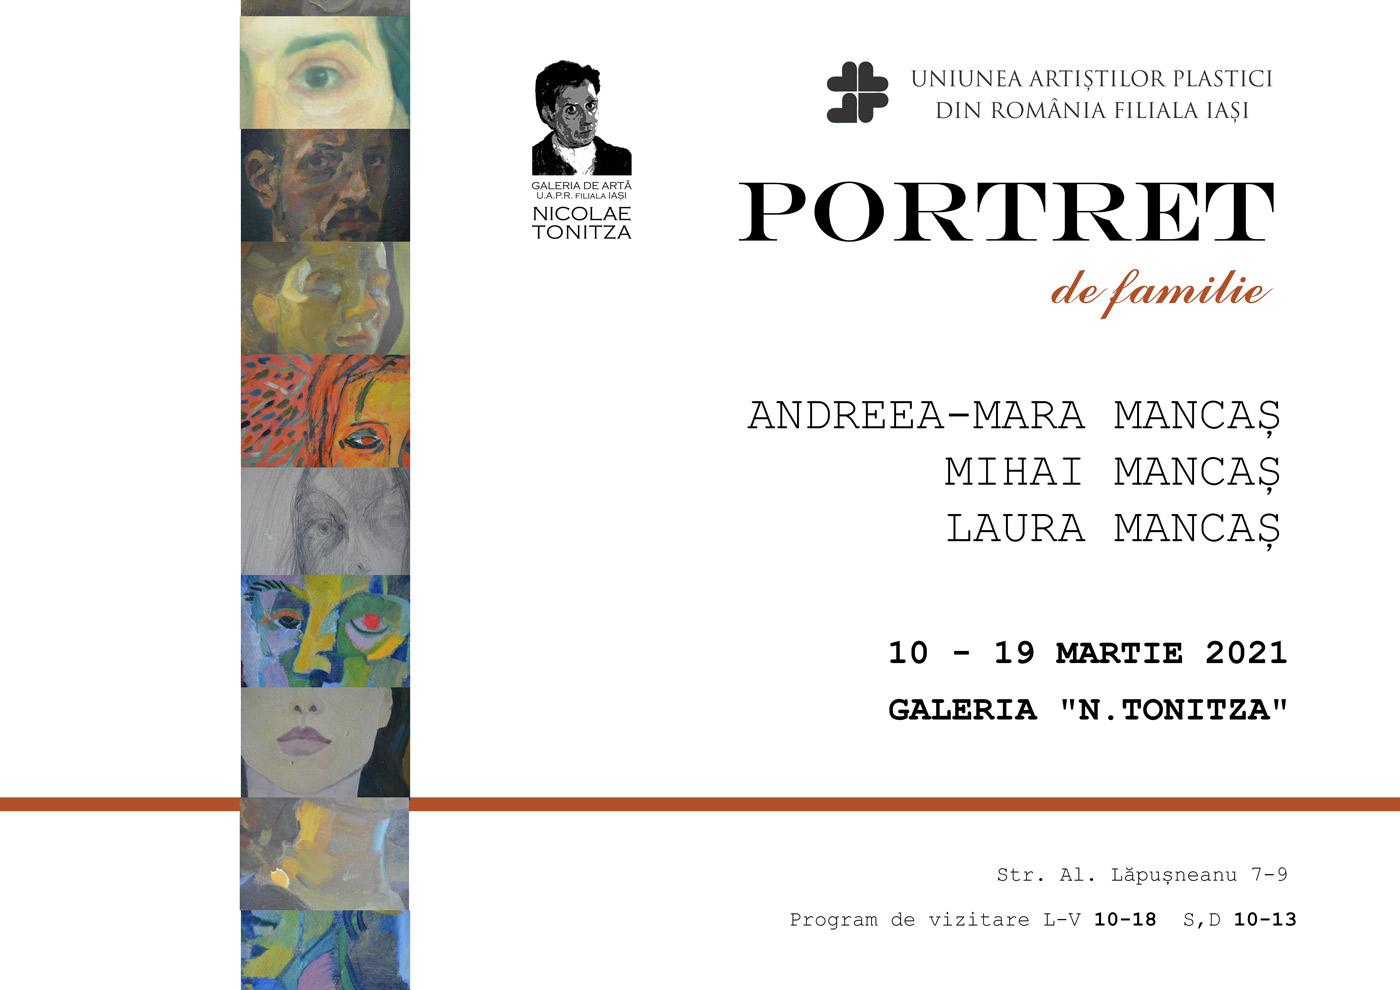 Portret de familie - Andreea – Mara Mancaș, Mihai Mancaș, Laura Mancaș